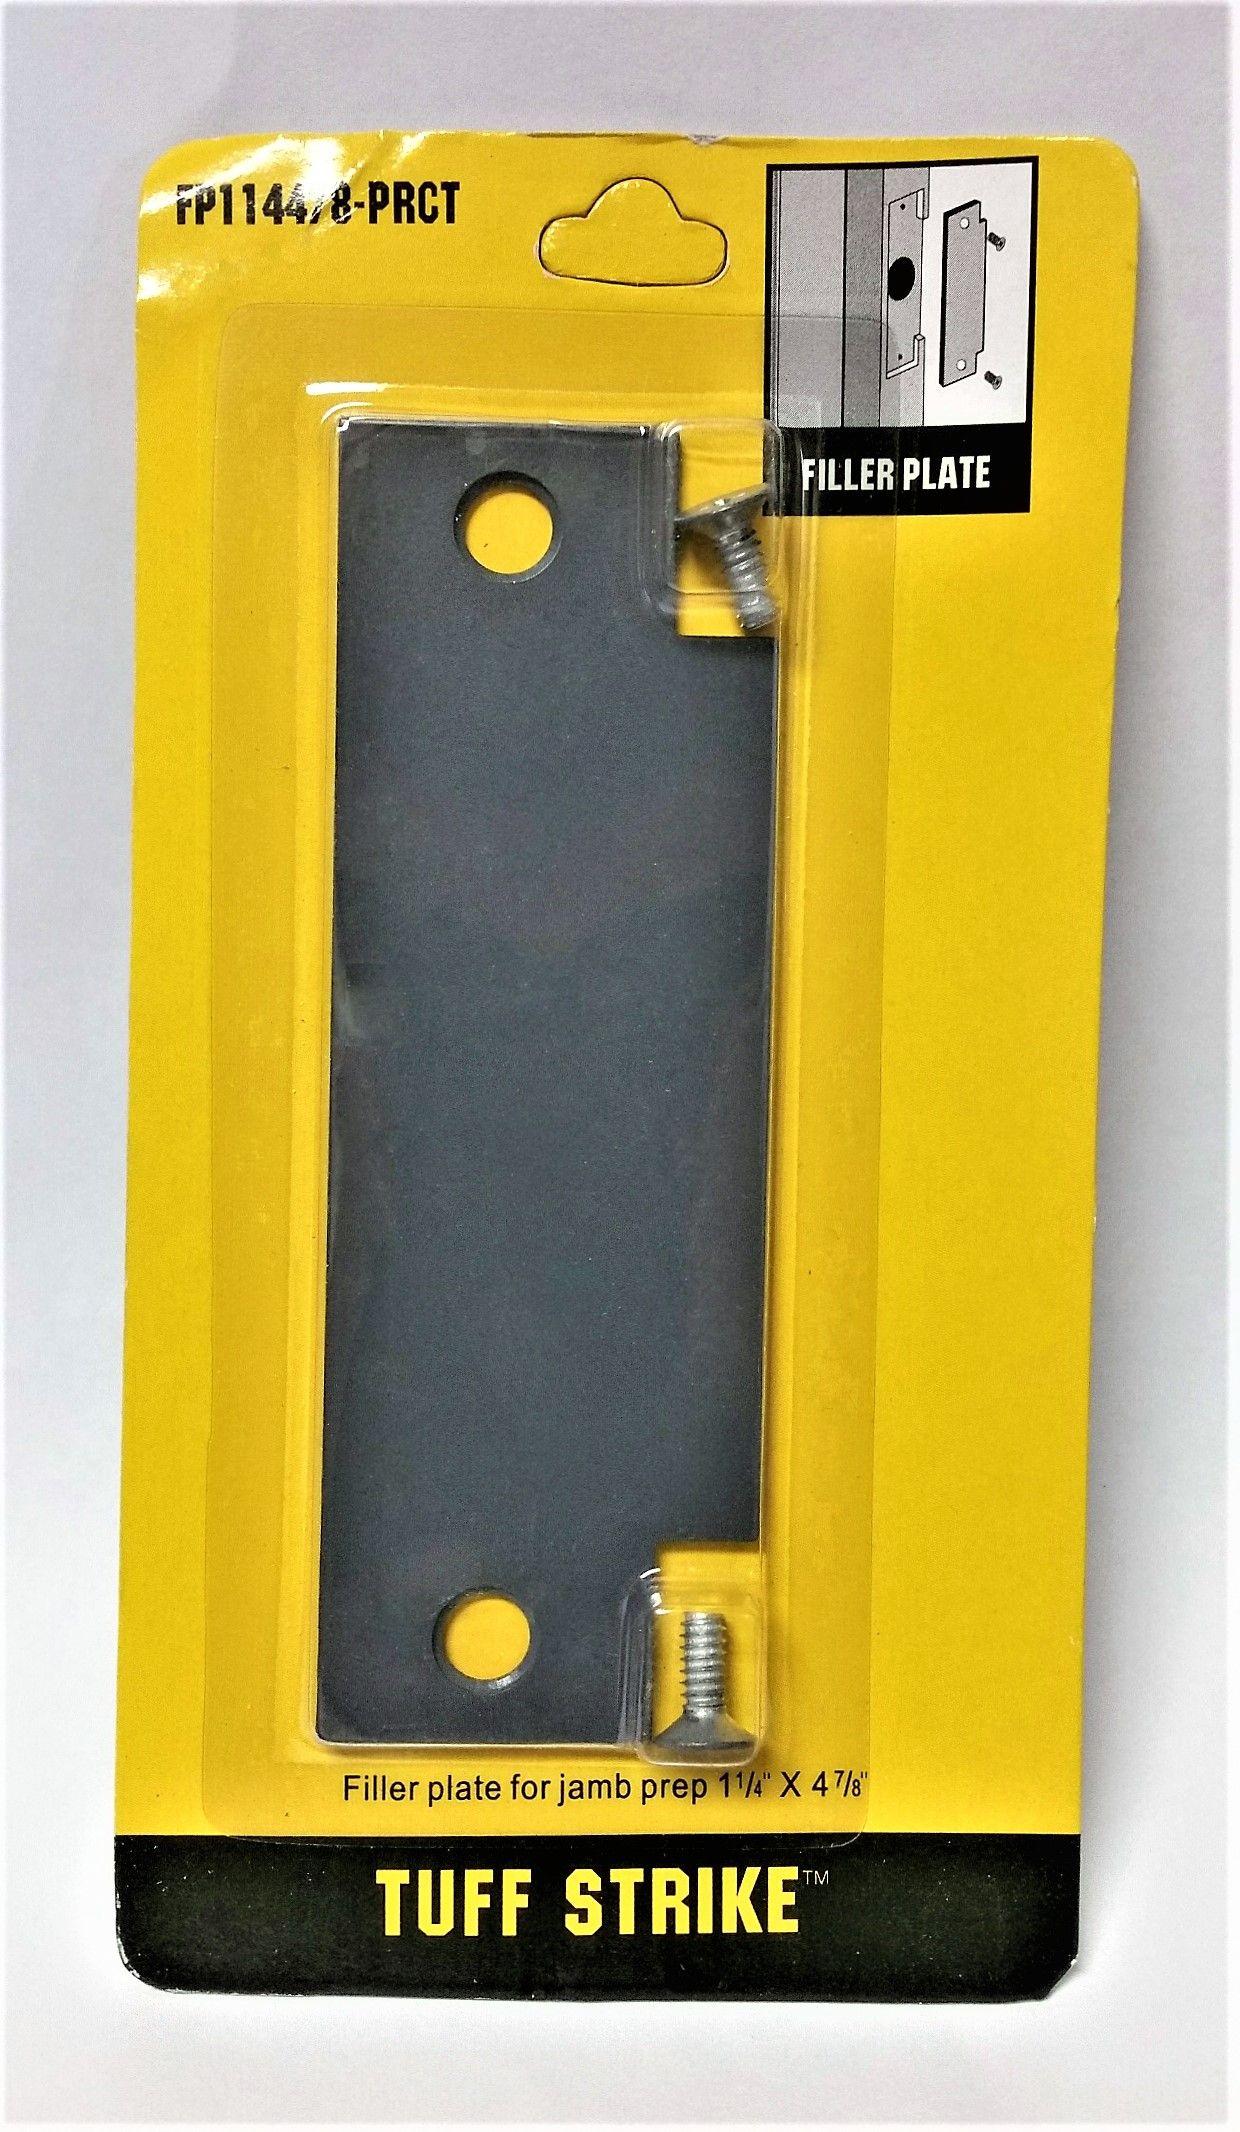 Filler Plate in Prime Coat finish by TUFF STRIKE 1 1/4